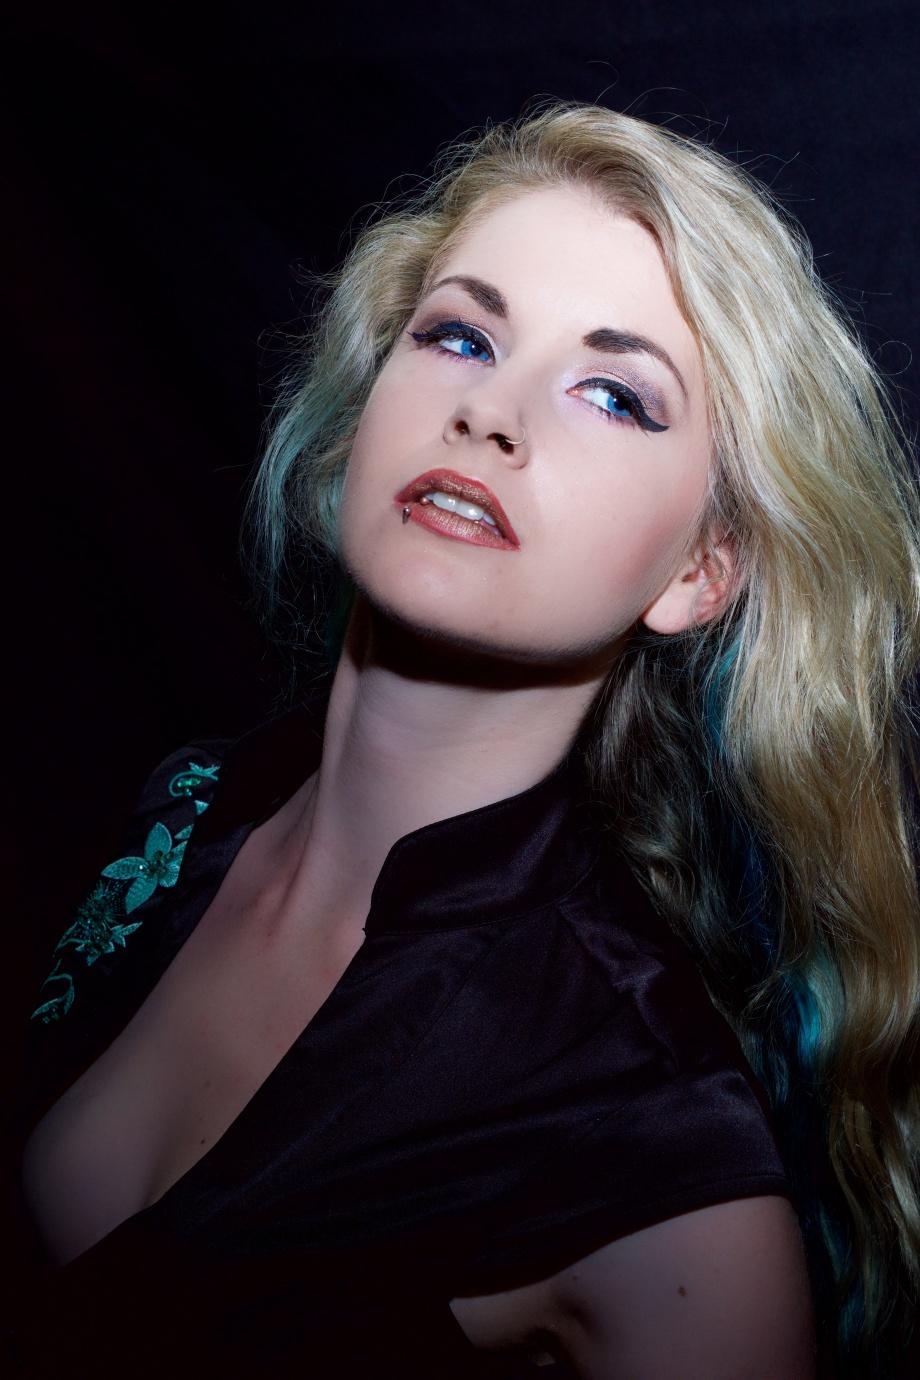 portrait, blonde, Die Baroness, Jenny Schmiedel, eyes, glamour, cork, ireland